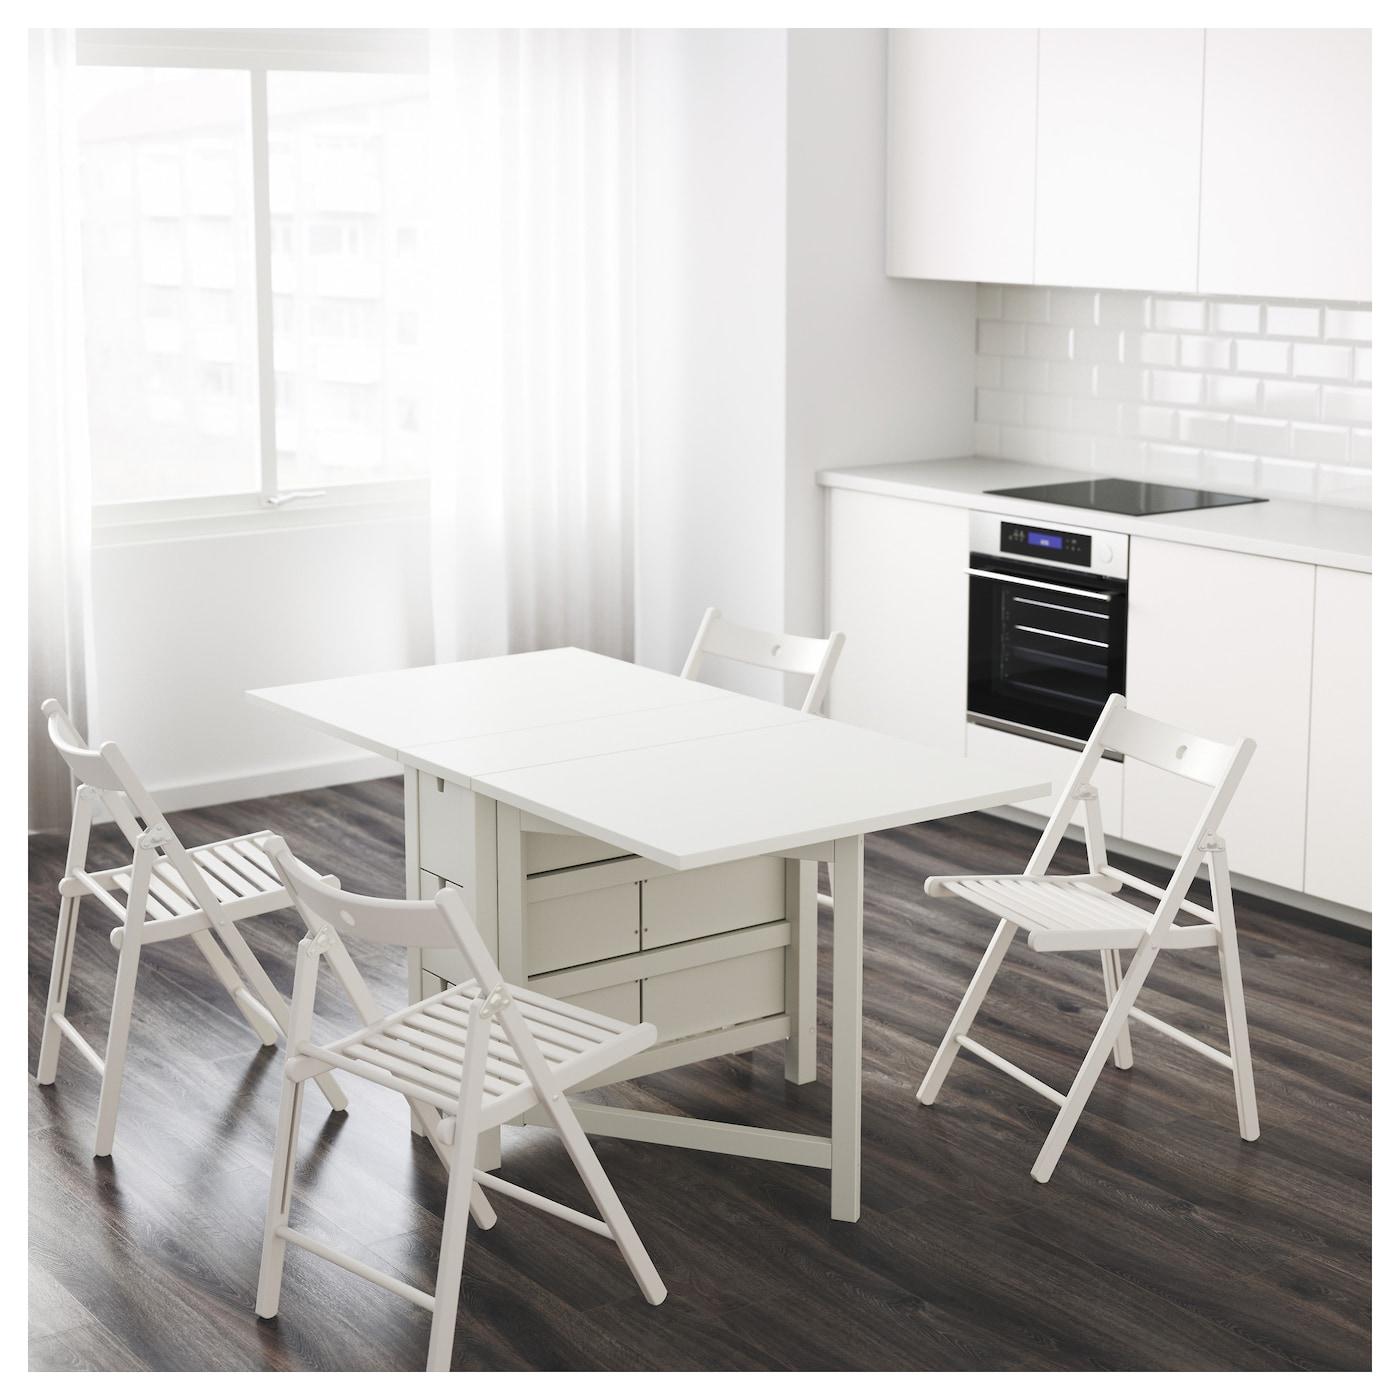 NORDEN Mesa alas abatibles Blanco 26/89/152 x 80 cm - IKEA